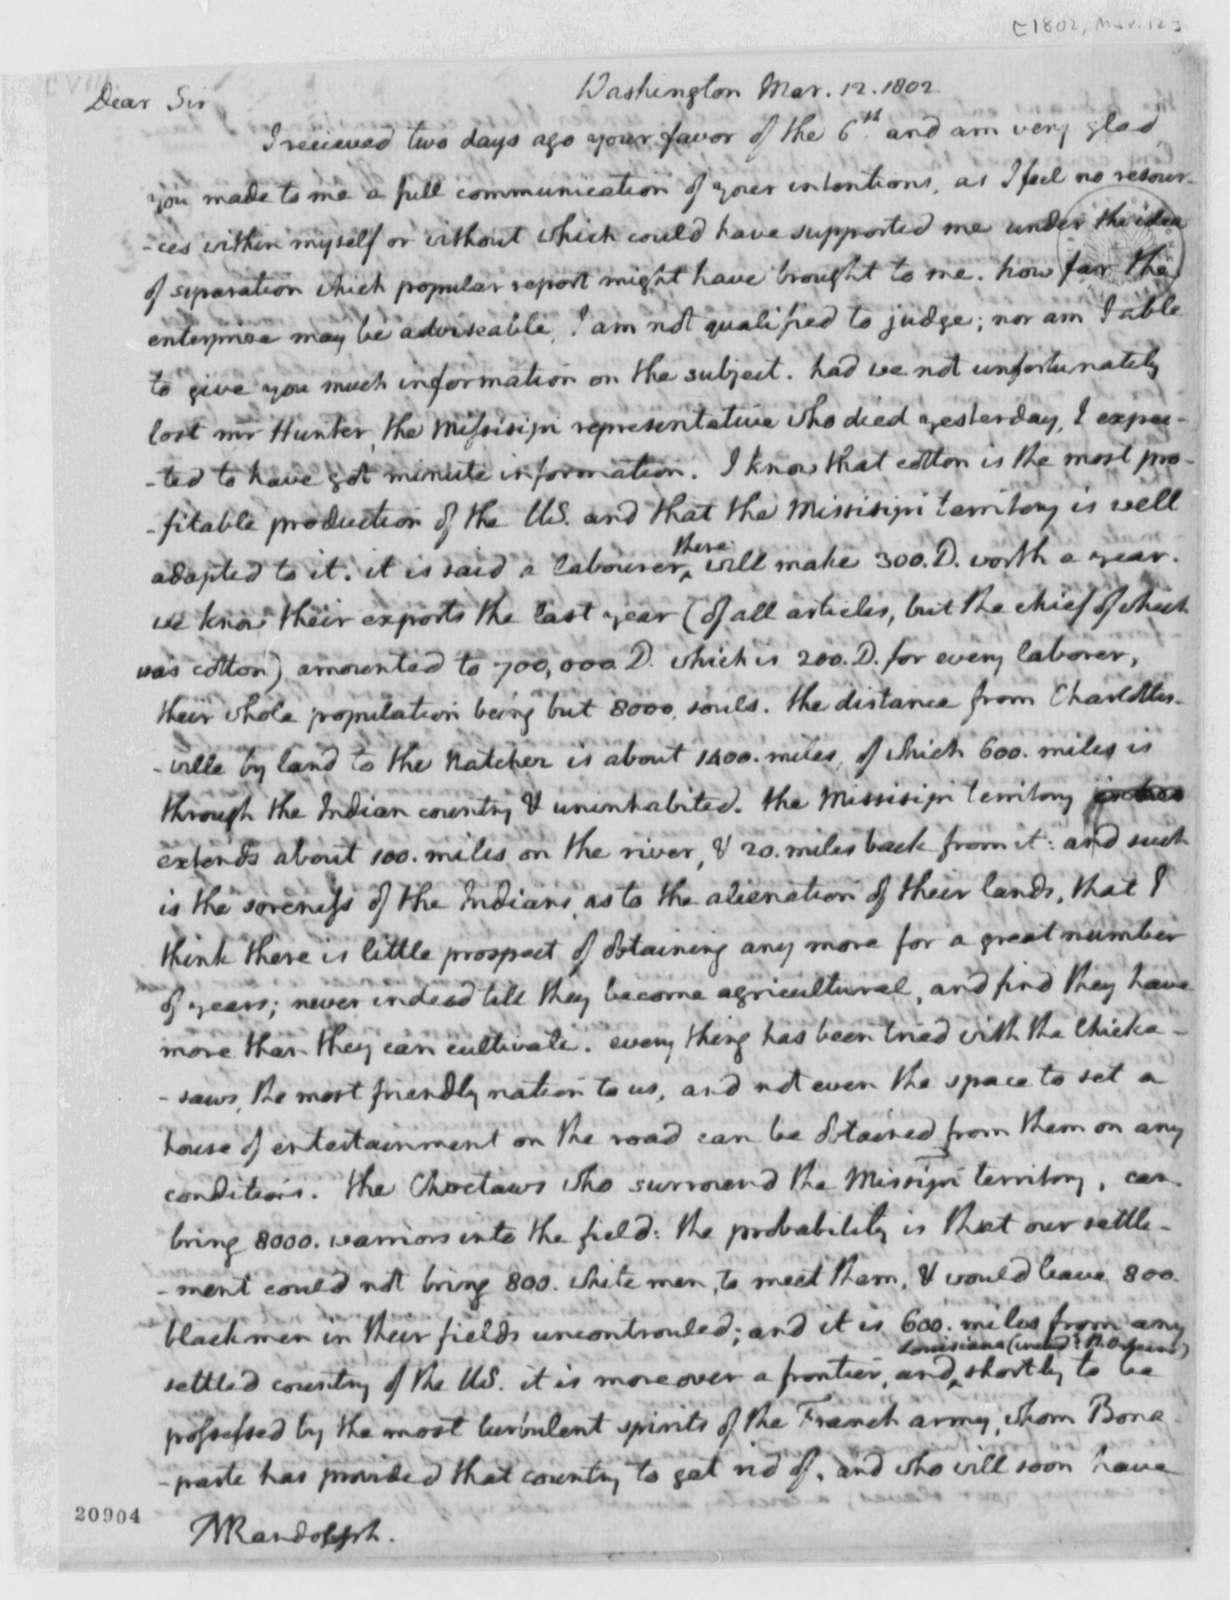 Thomas Jefferson to Thomas Mann Randolph, Jr., March 12, 1802